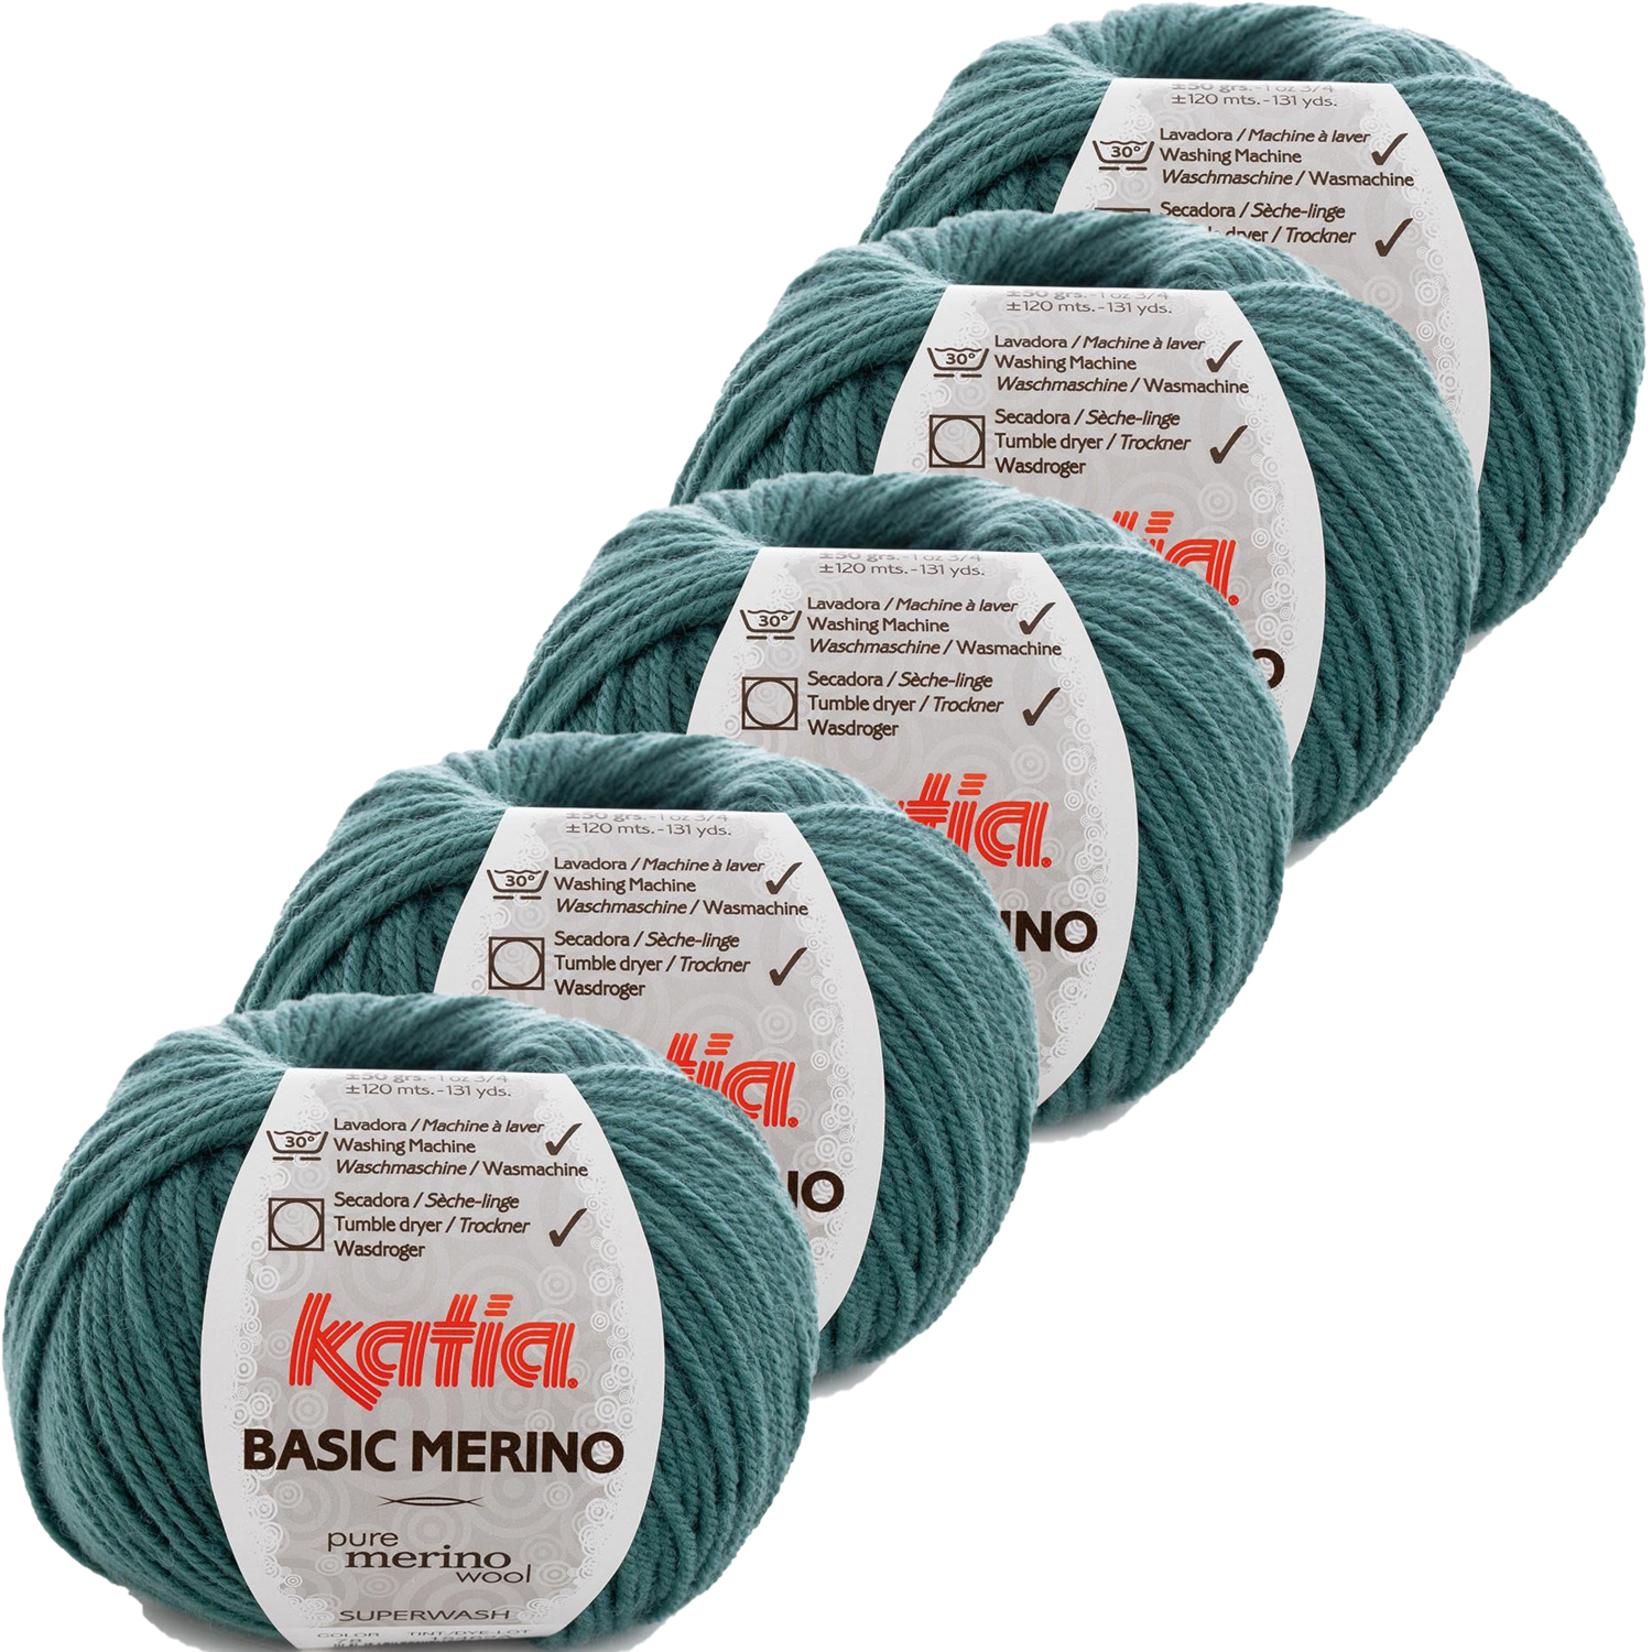 Katia Basic Merino - kleur 78_Smaragdroen - bundel 5 bollen 50 gr.  van 120 m.